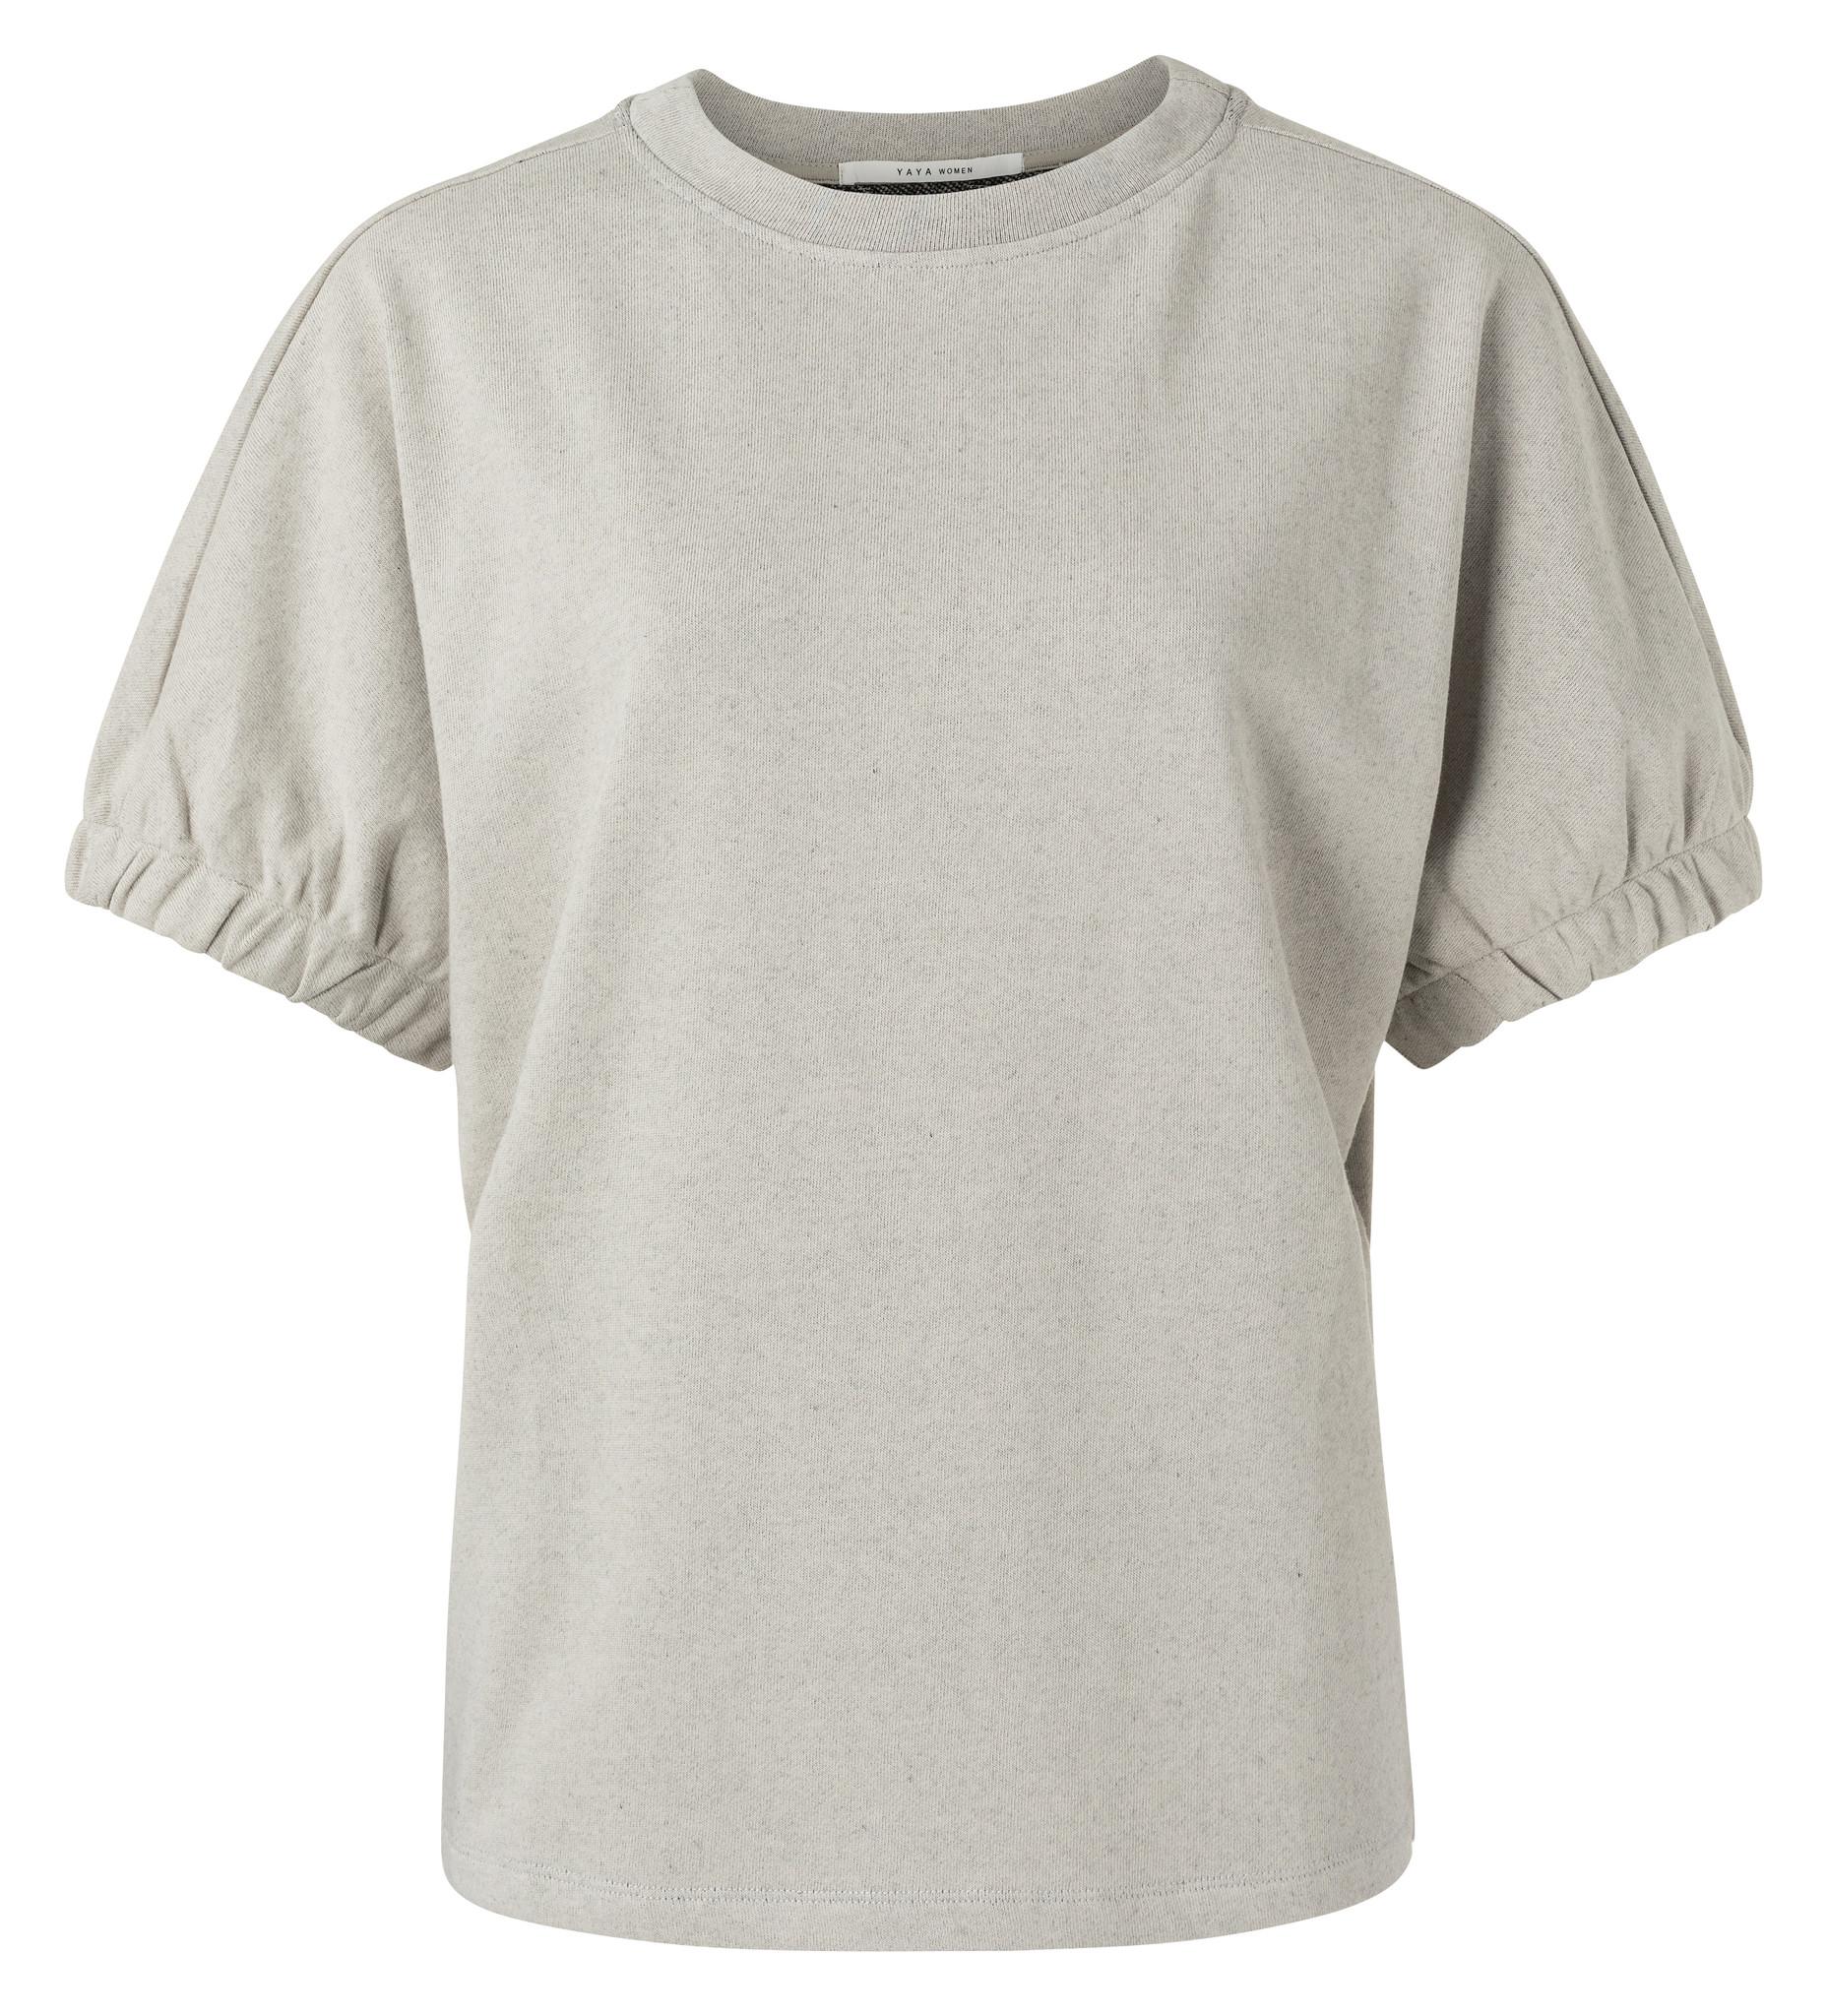 yaya Elastic cuff sweater 1009429-113-1